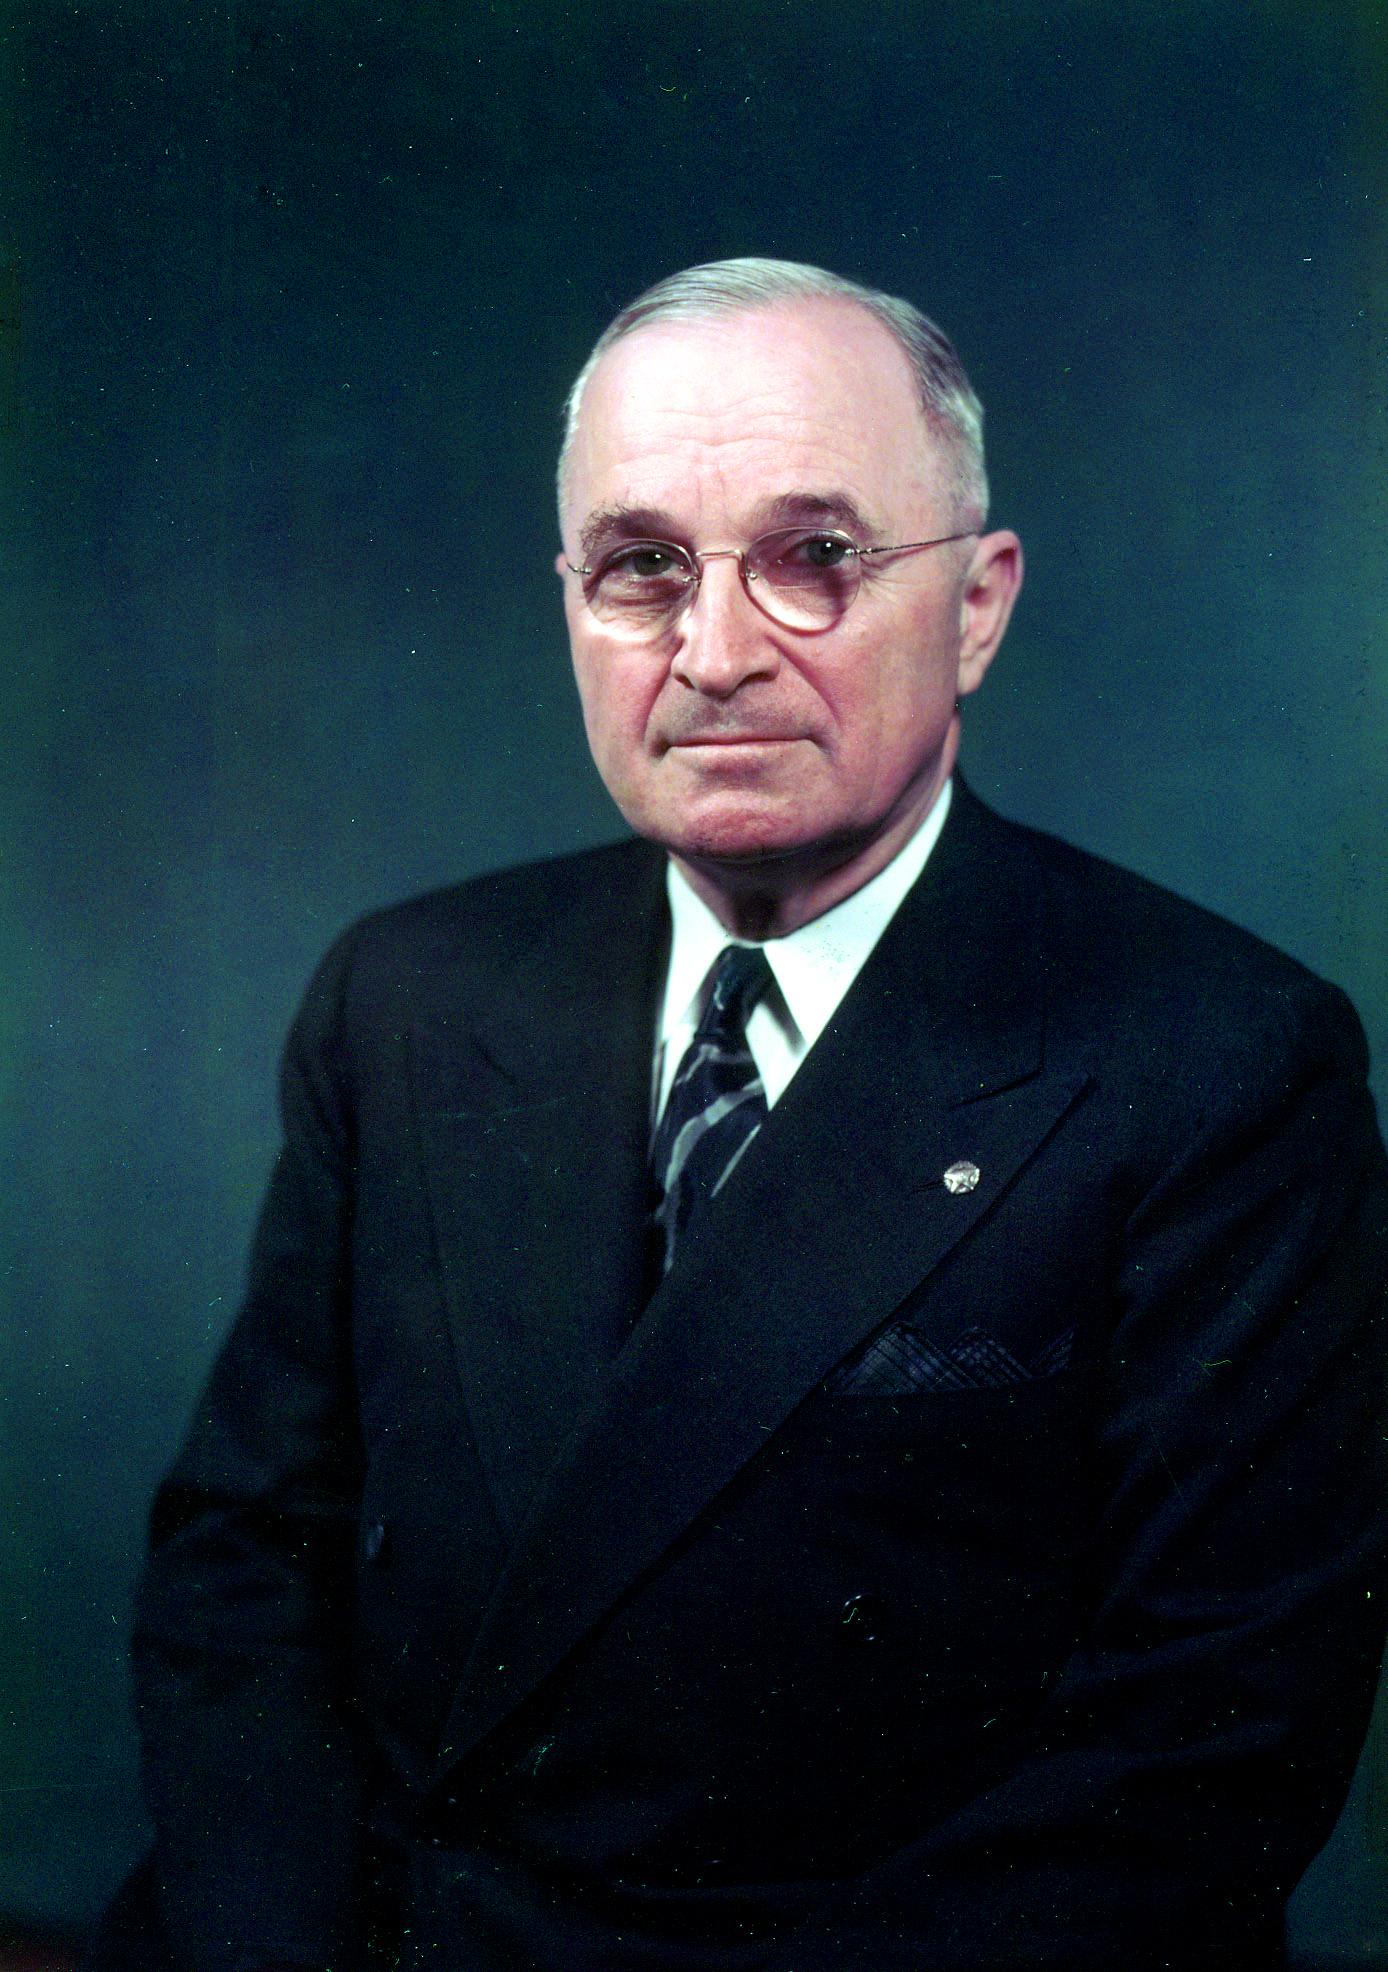 Truman administration